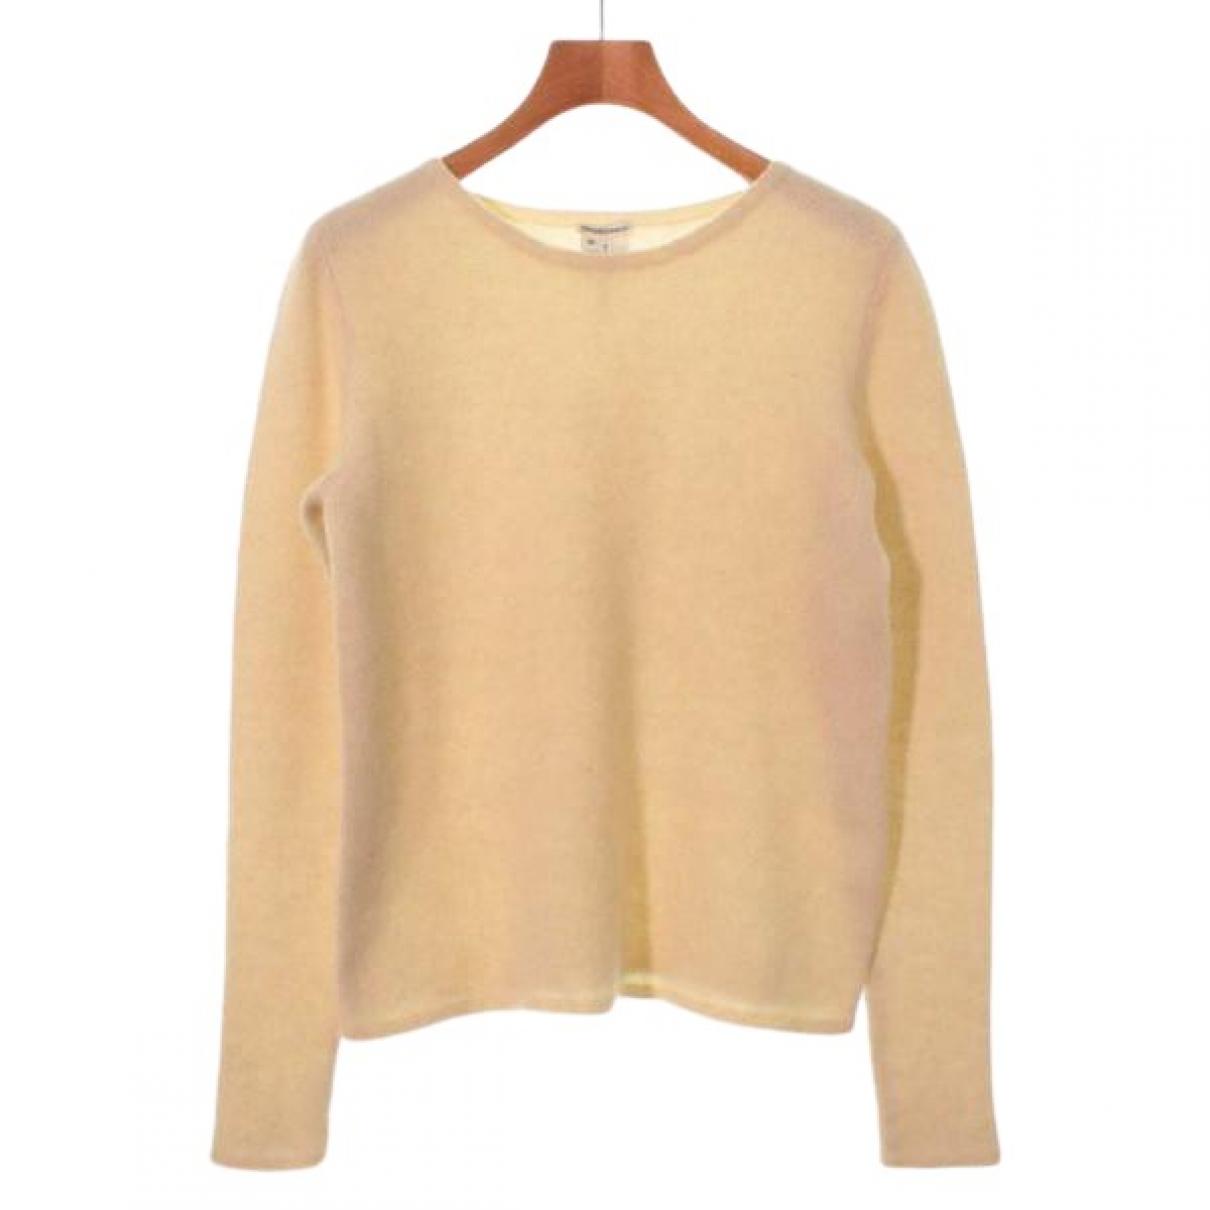 Hermes - Pull   pour femme en cachemire - beige